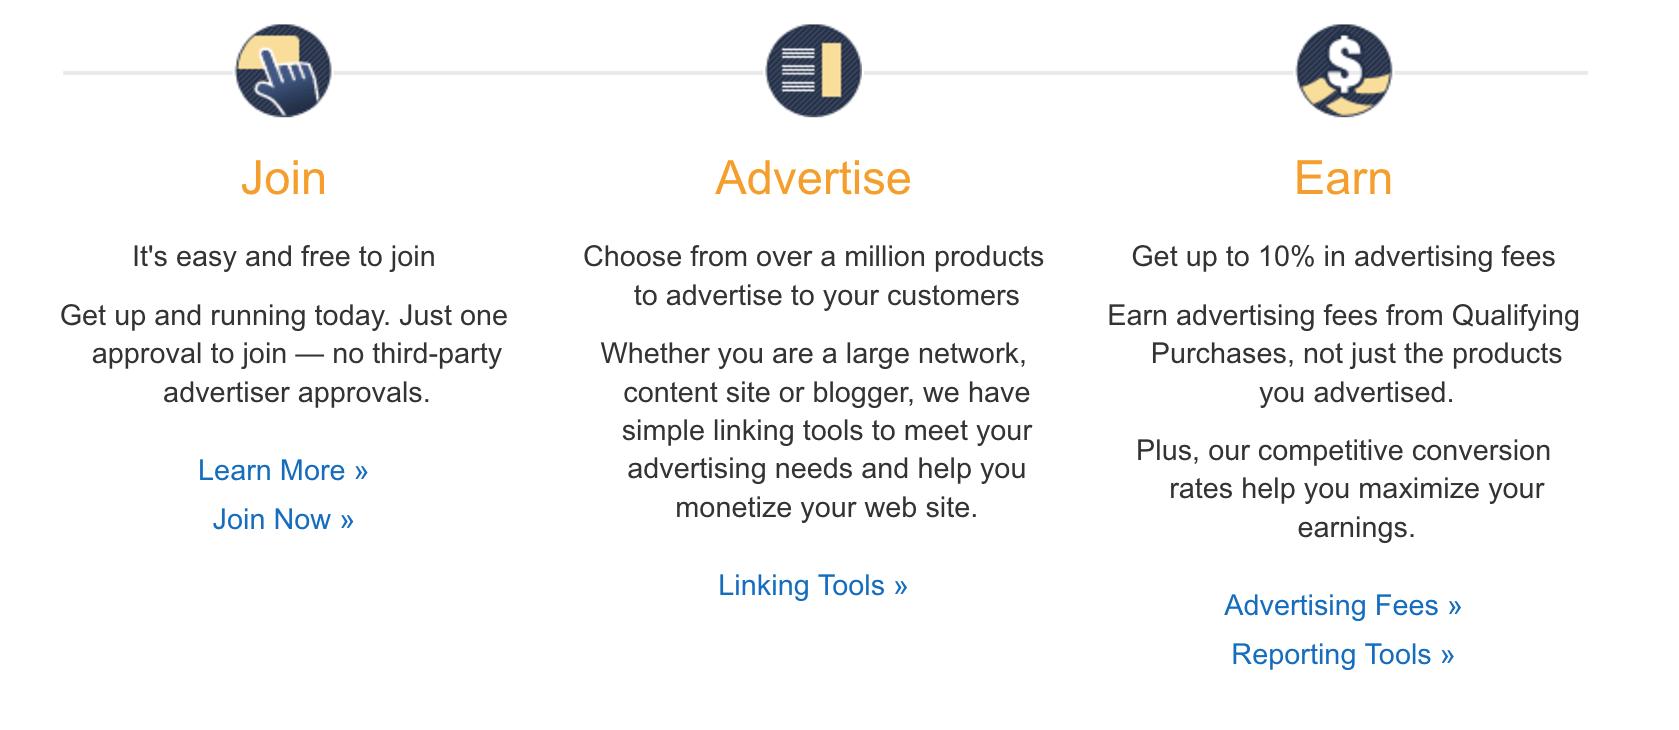 The Amazon Associates program helps Amazon crowdsource their marketing efforts